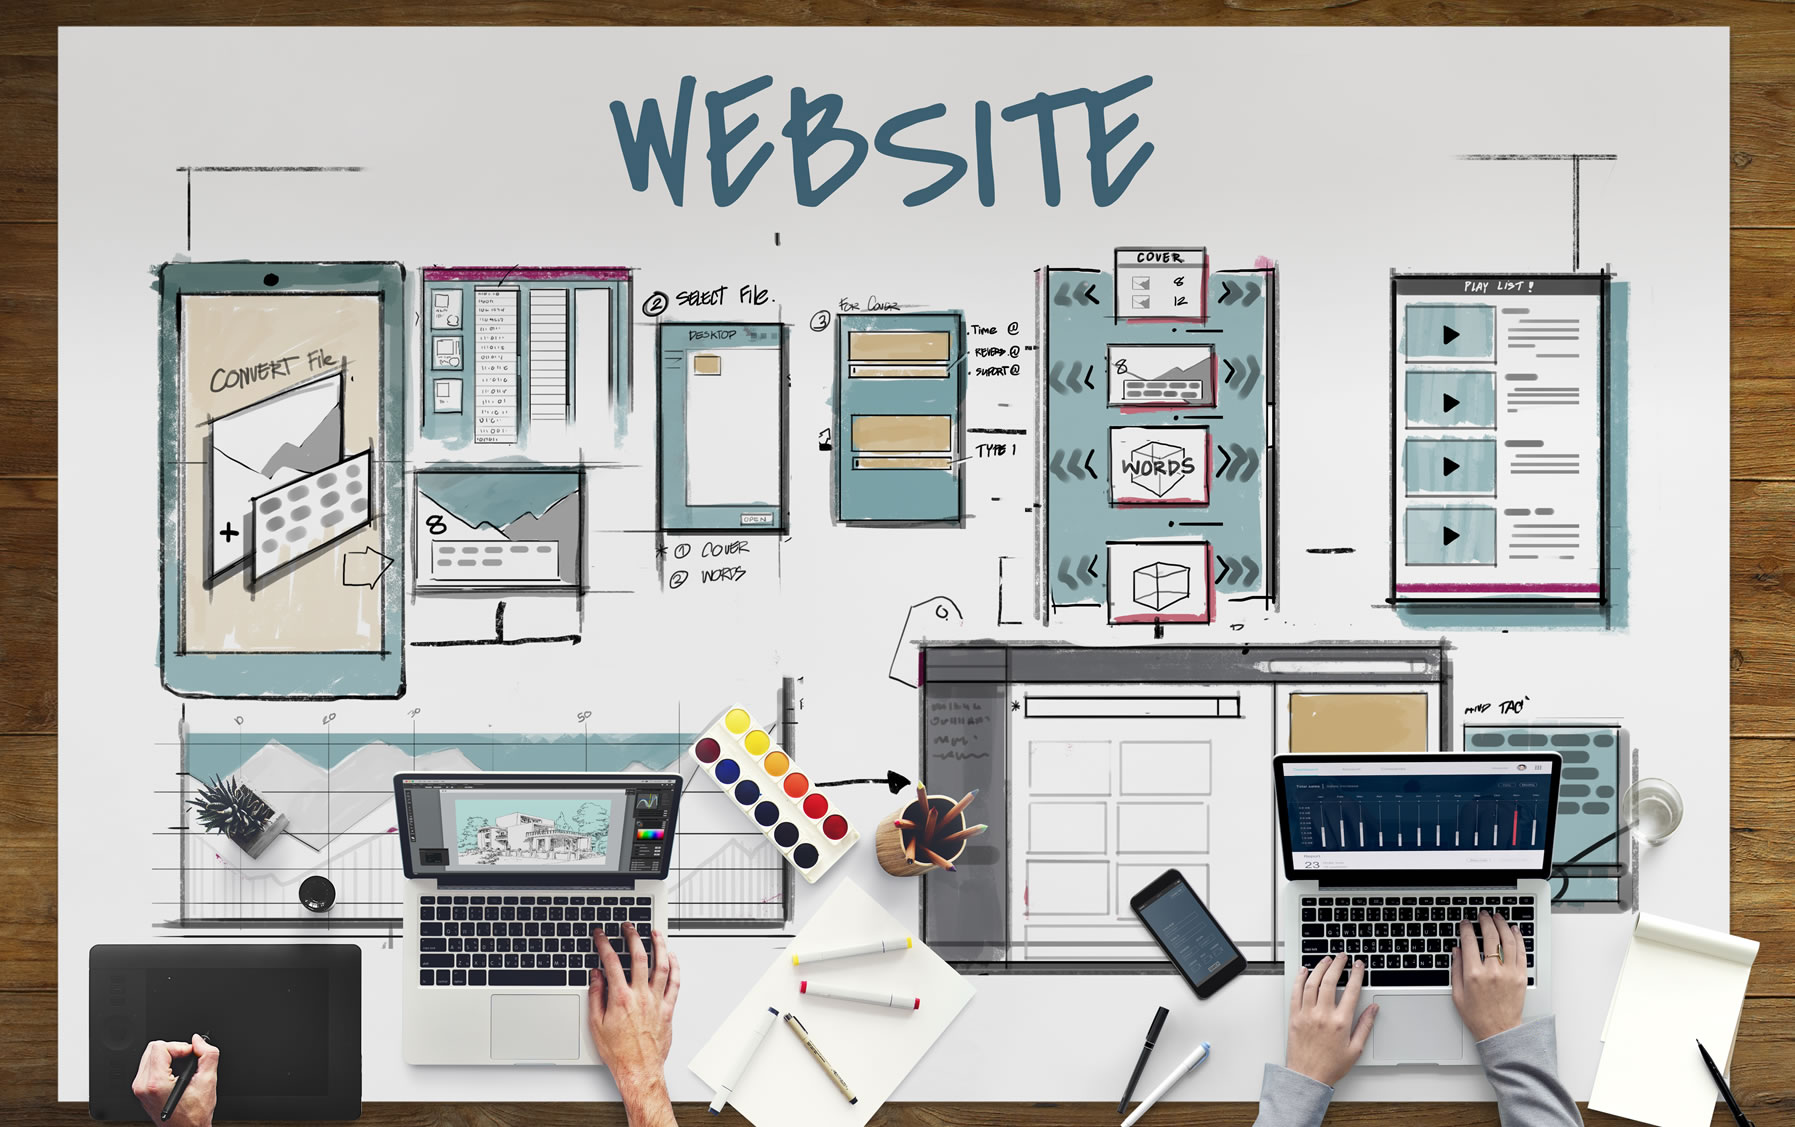 pensacola website redesign